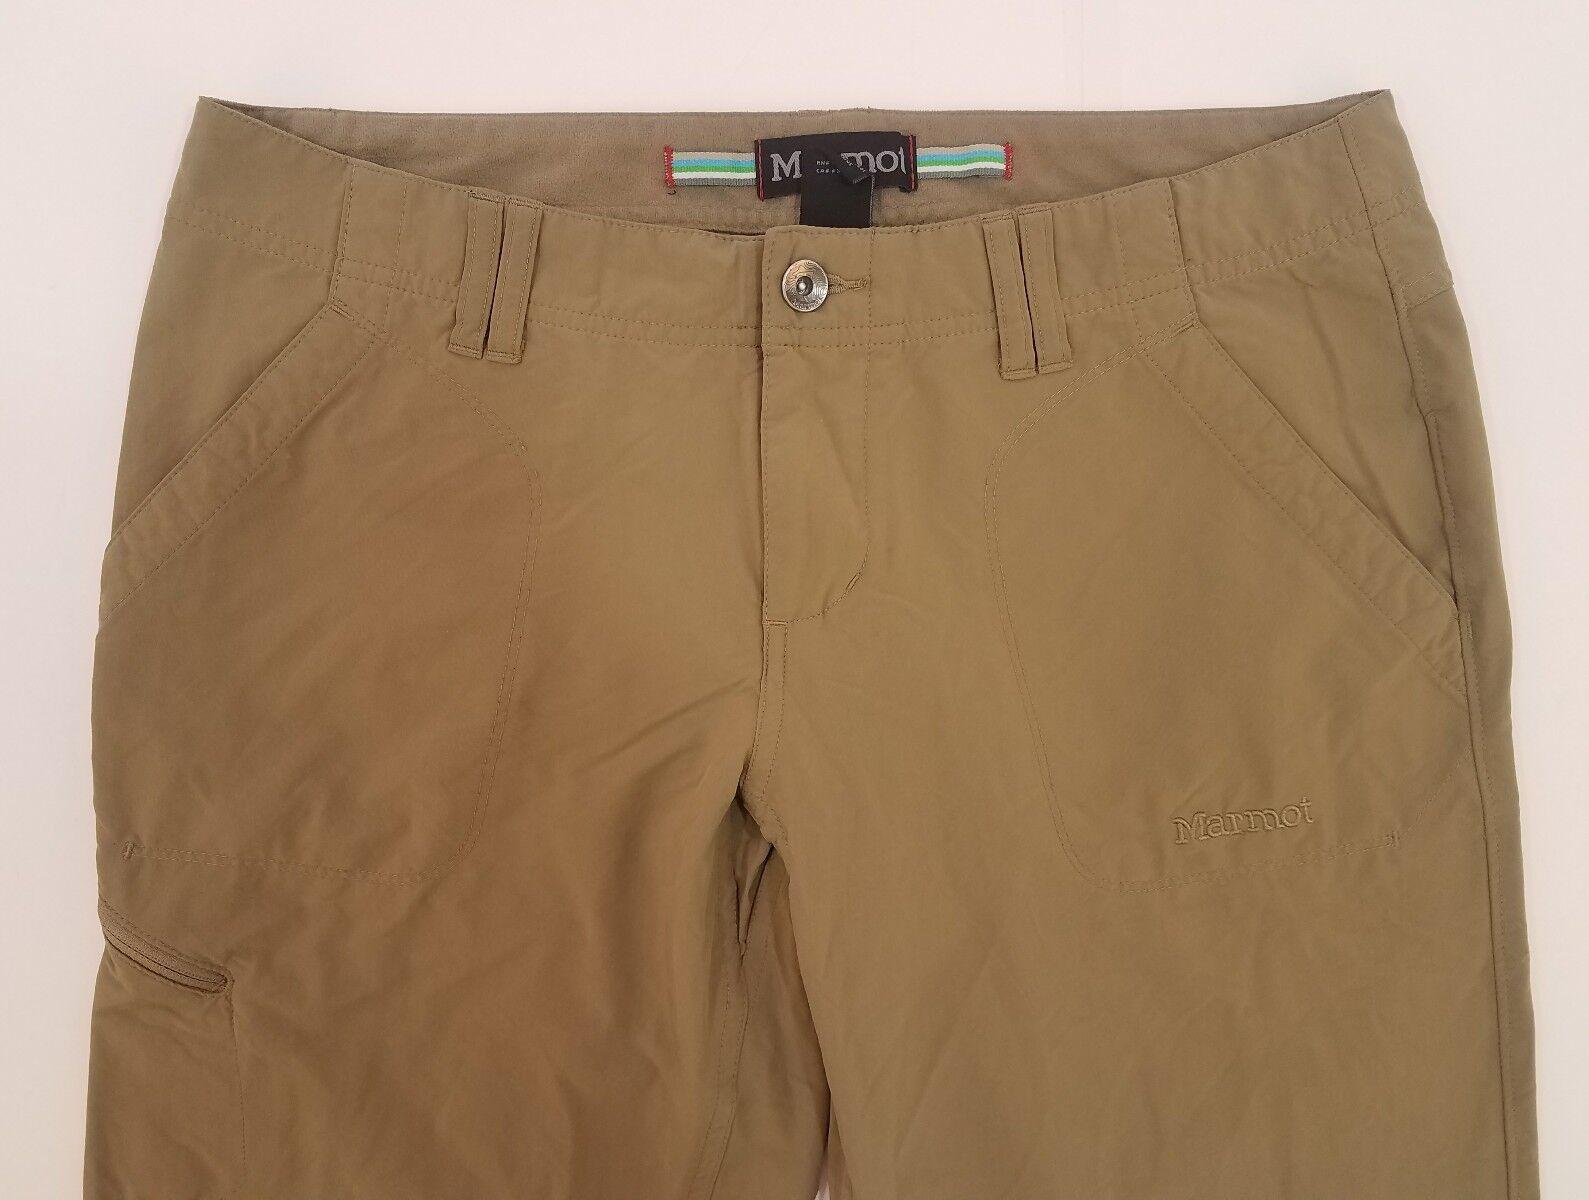 Womens Marmot Beige Lightweight Casual Hiking Cargo Pants Size 8 M Inseam 30